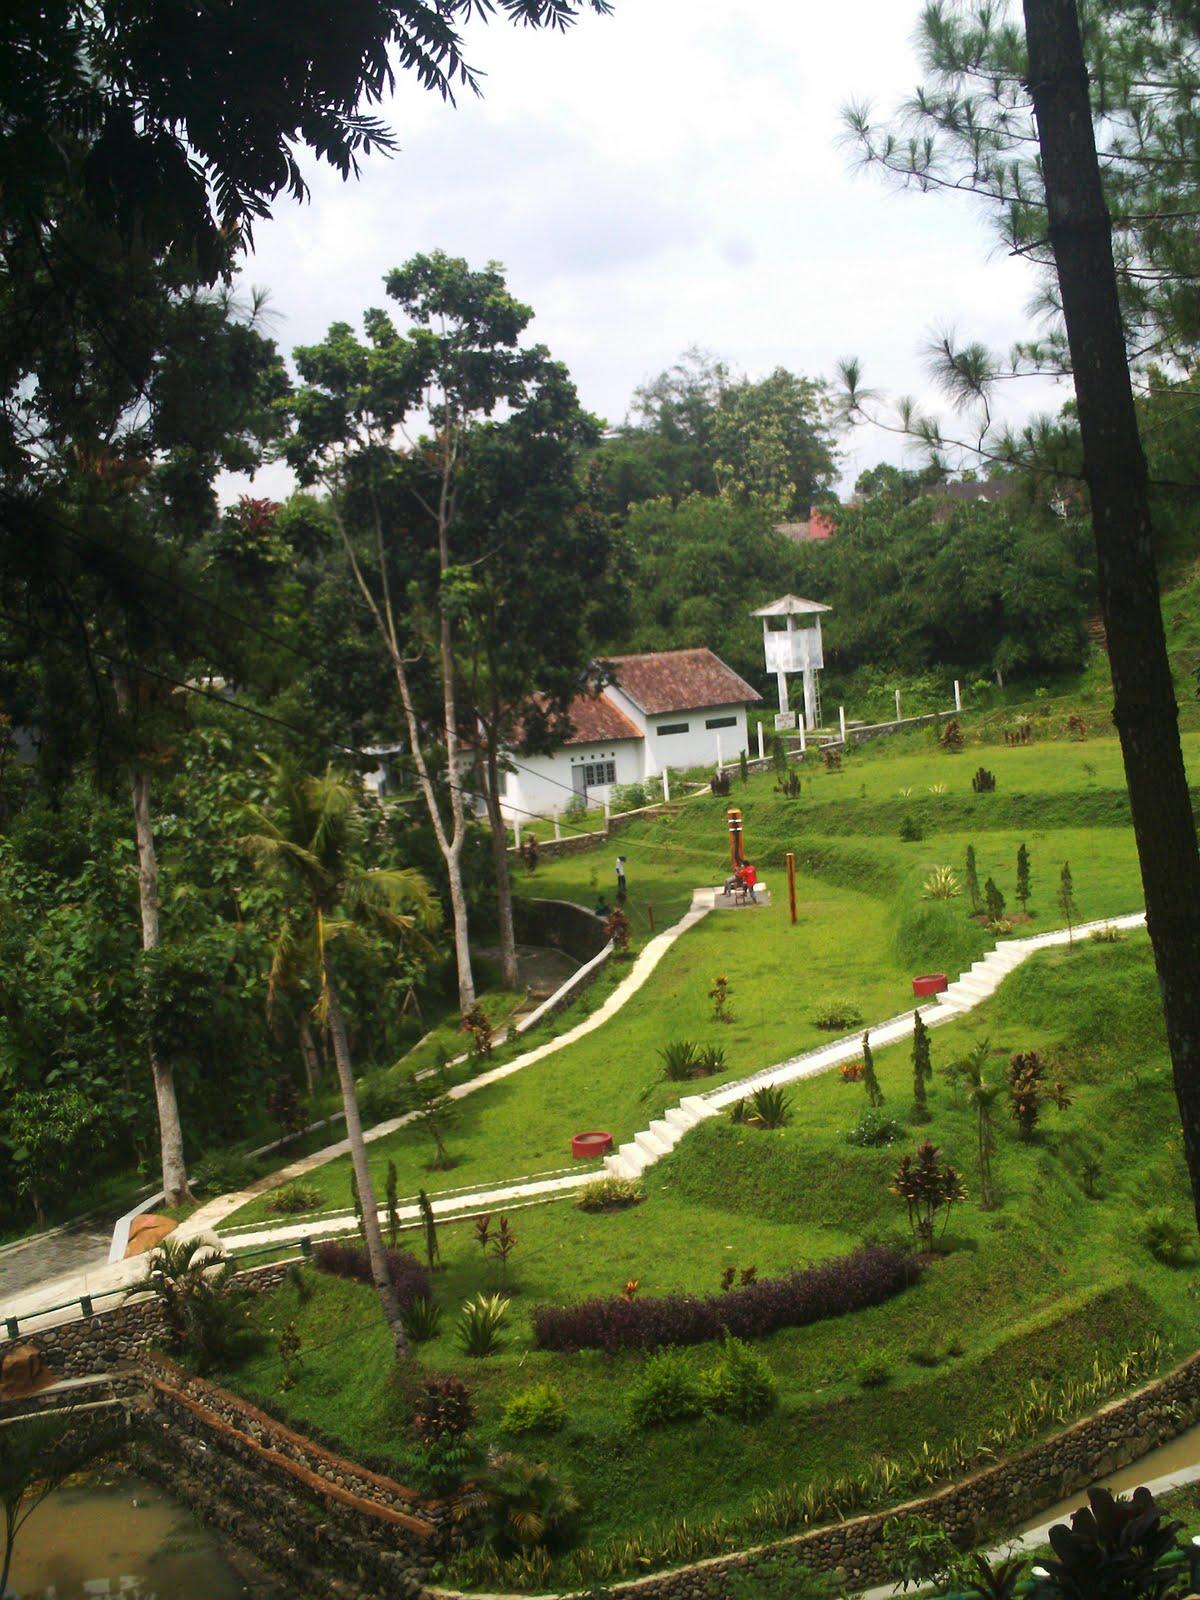 Taman Kyai Langgeng Wisata Yogyakarta Keluarga Suasana Alam Bebas Lengkap